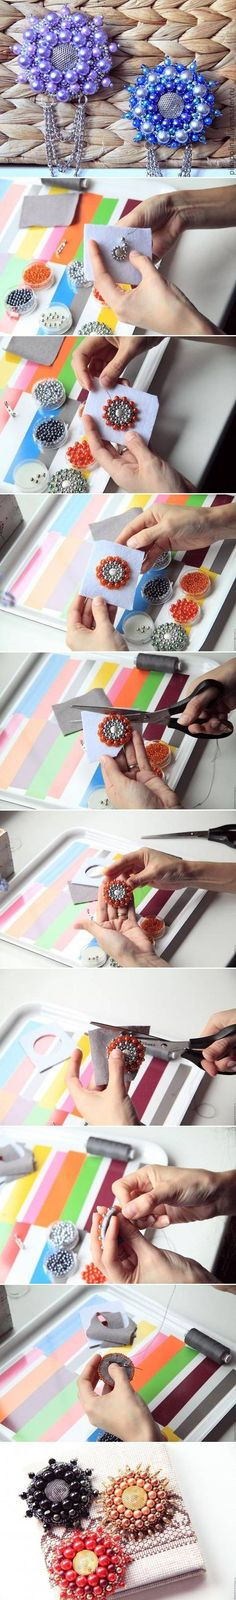 DIY Beads Flower Brooch DIY Projects / UsefulDIY.com